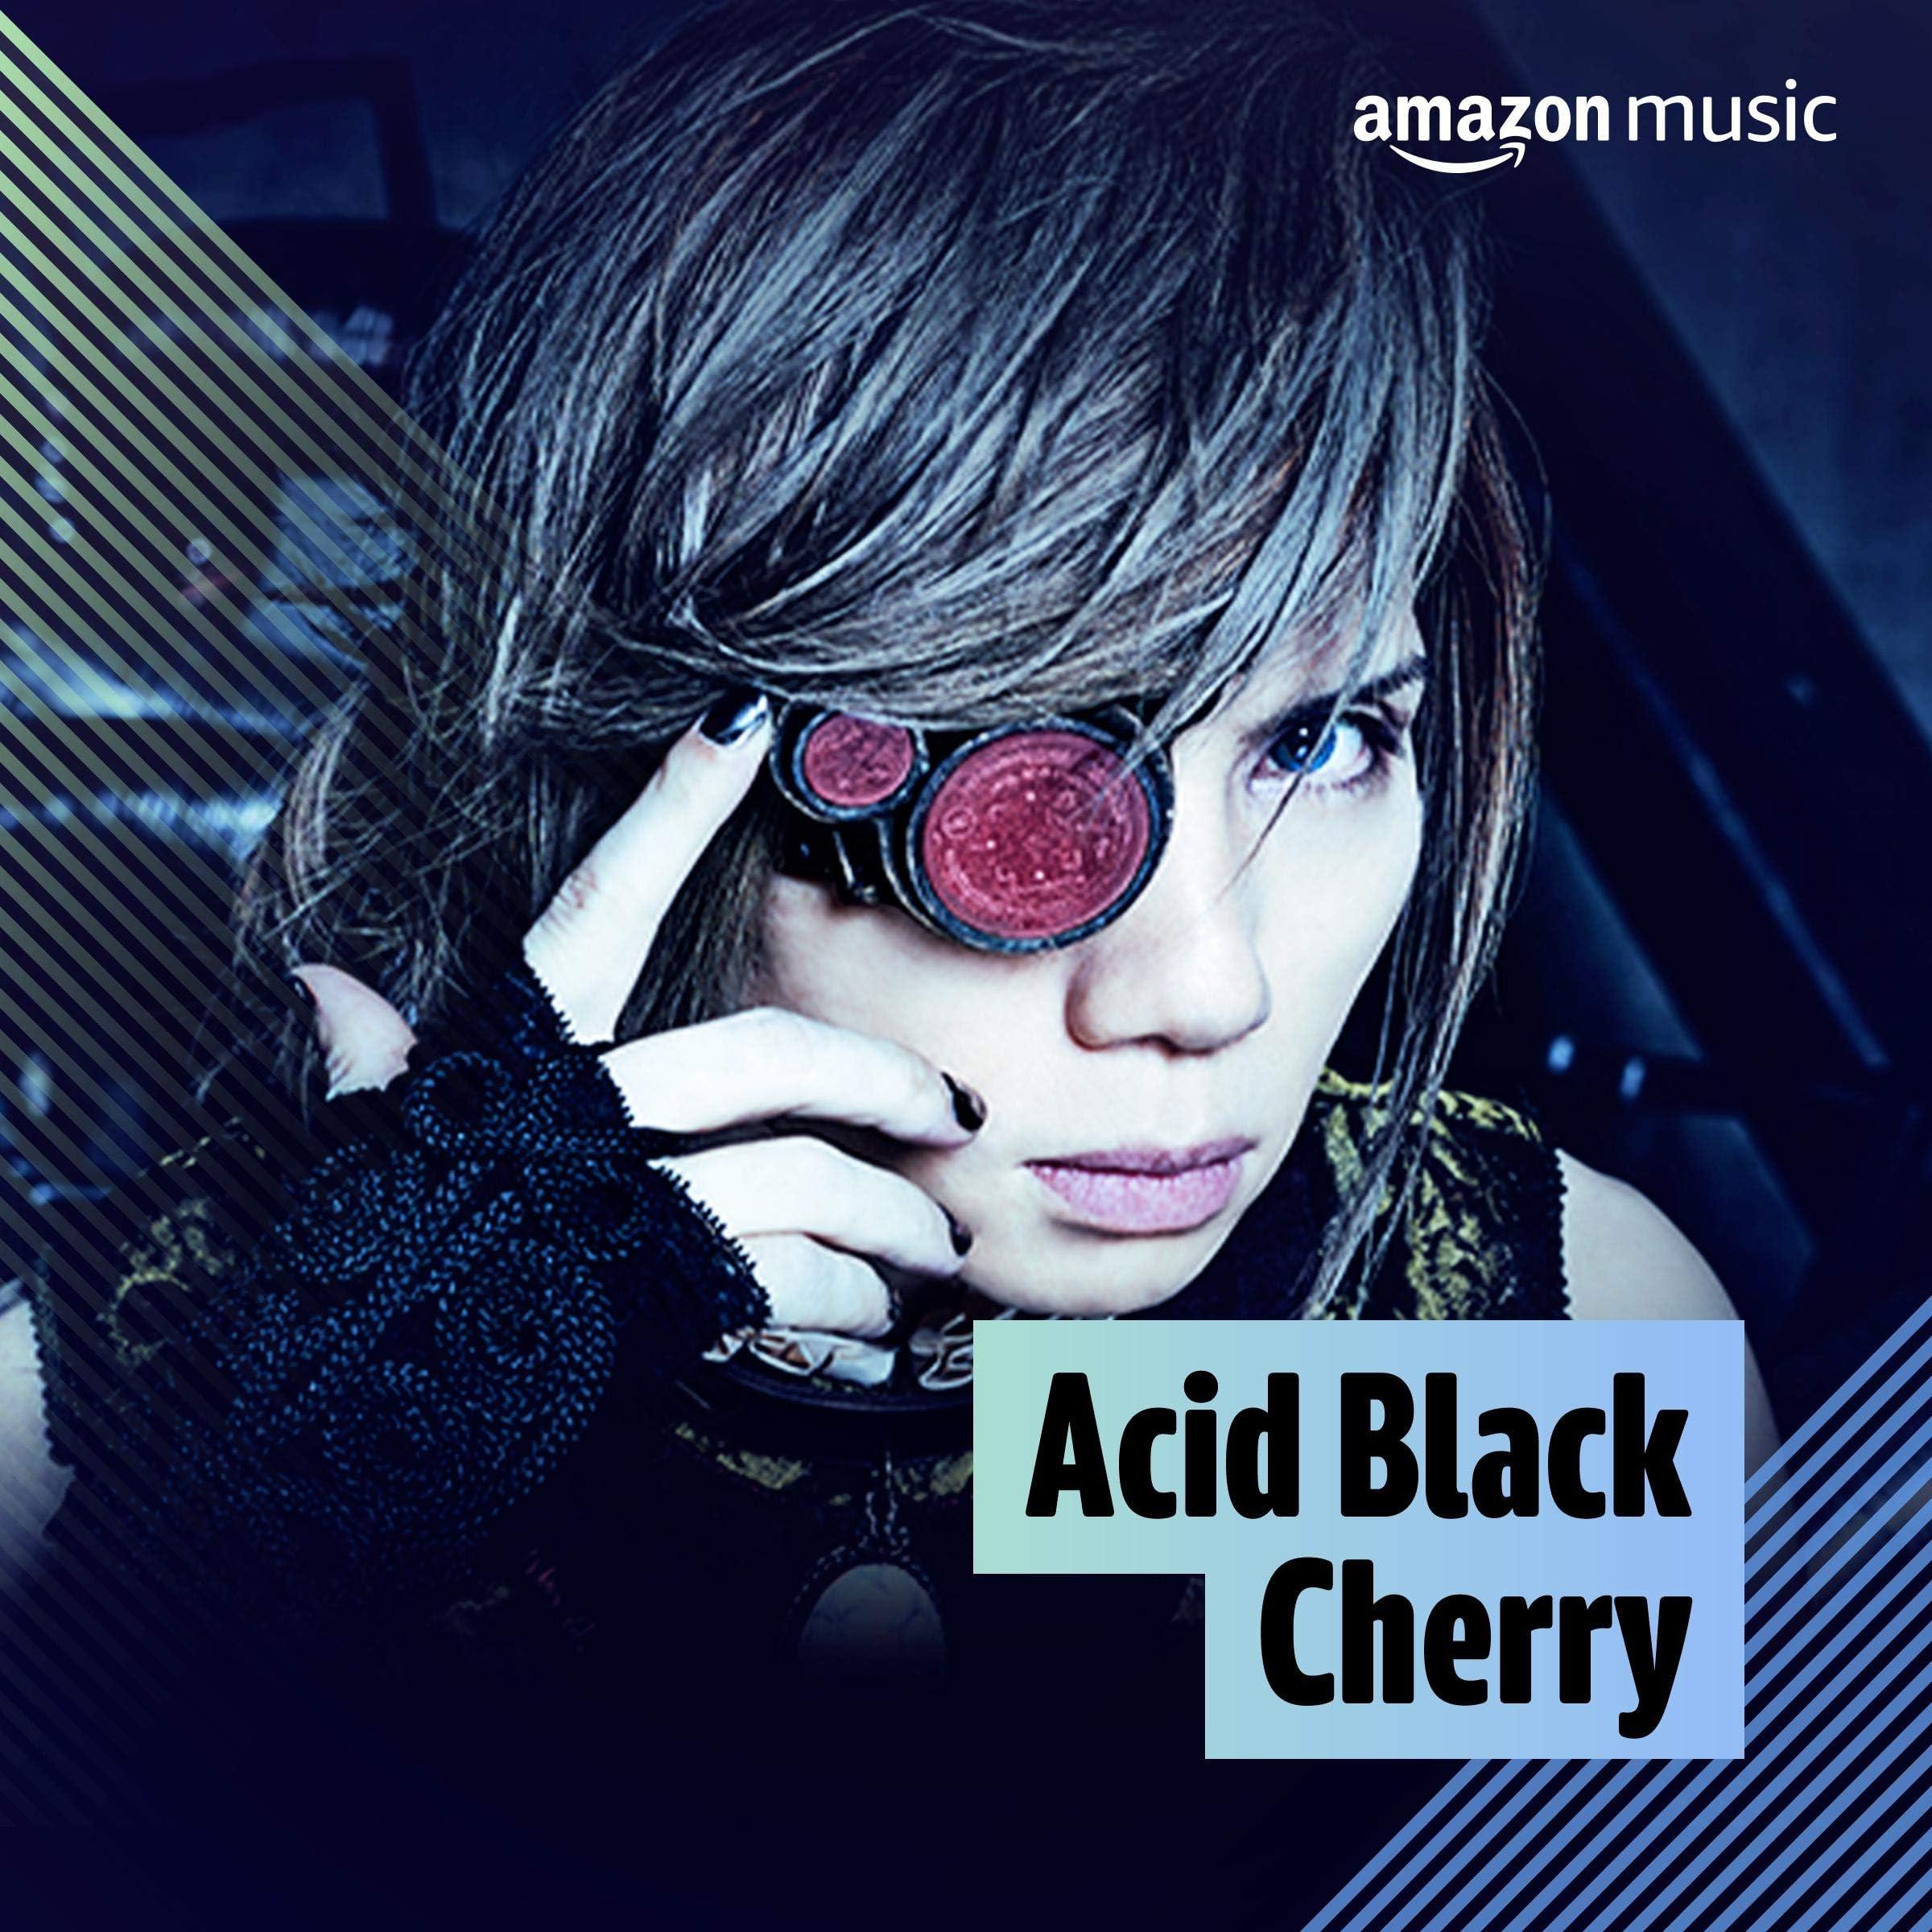 Acid Black Cherryを聴いているお客様におすすめ